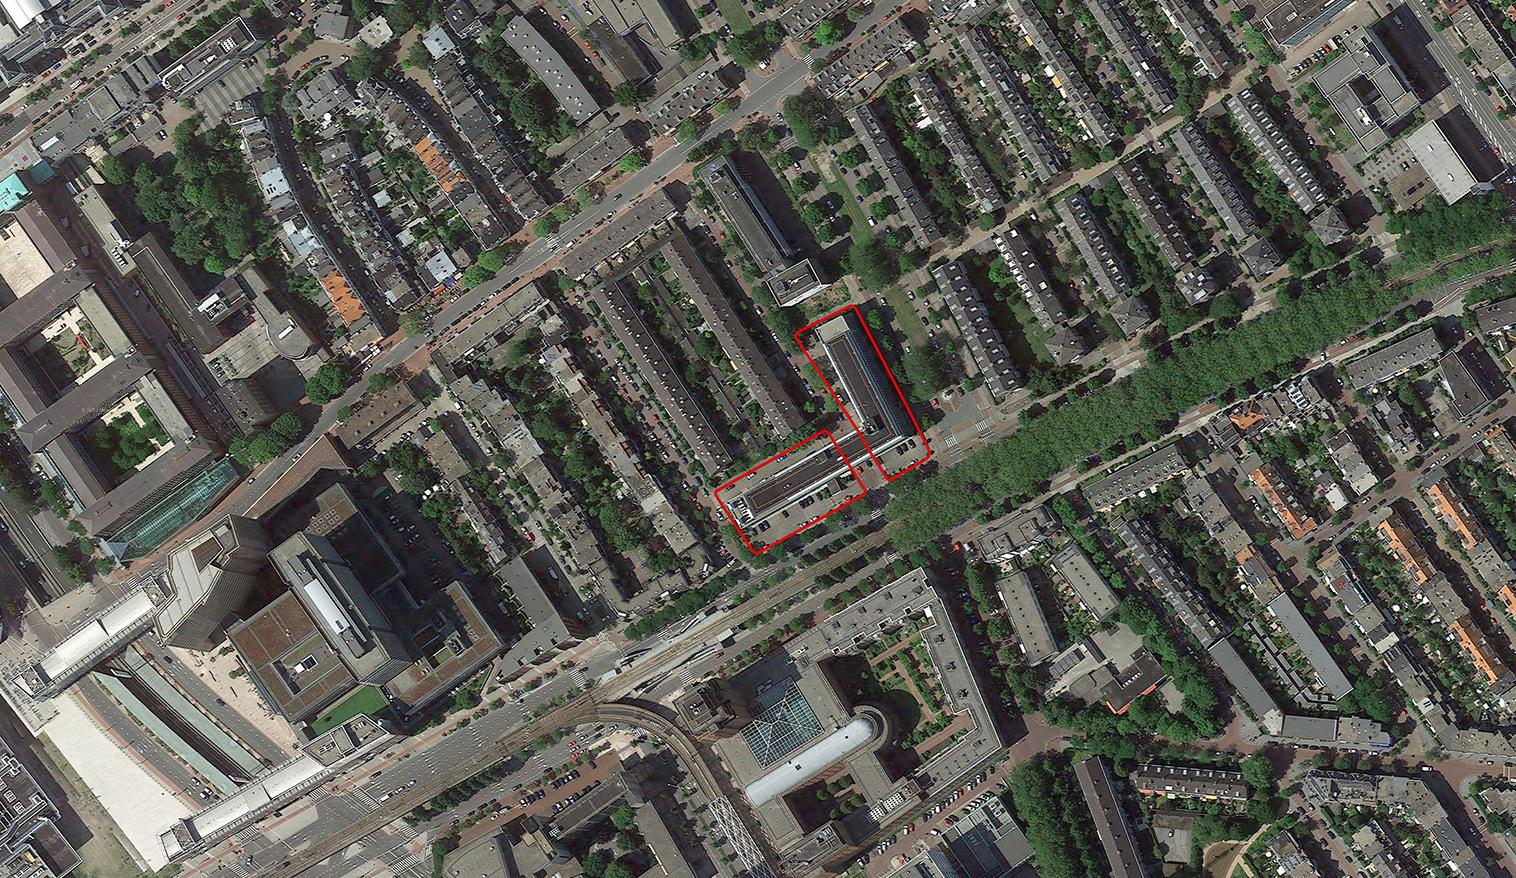 03 OPL Architecten_Woningen Bezuidenhout-1516×878-72dpi